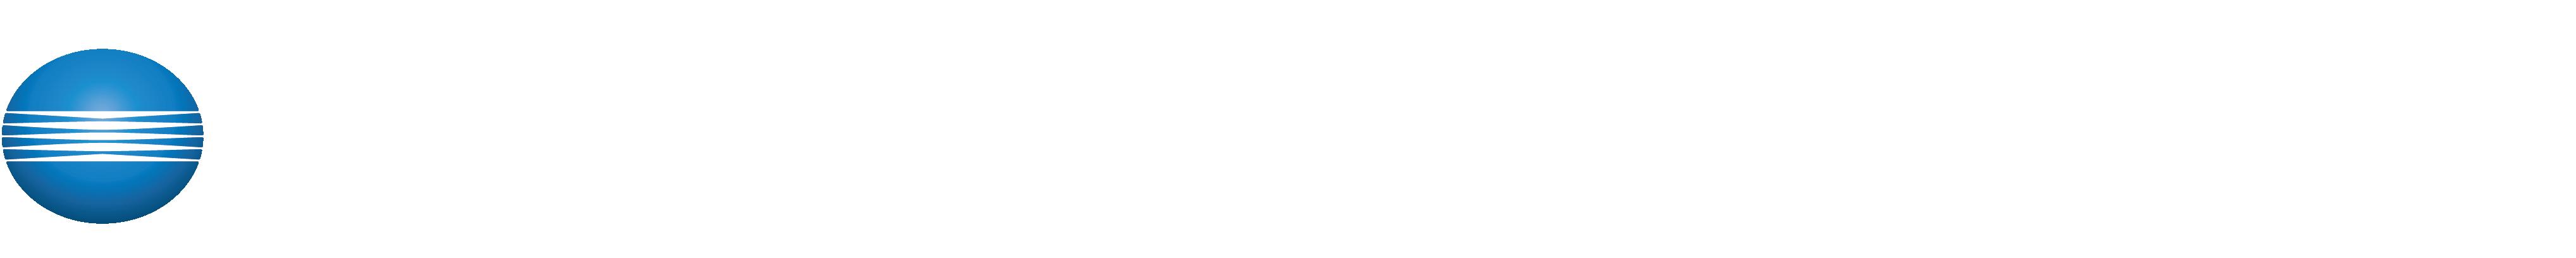 Konica Minolta Sensing Americas Logo